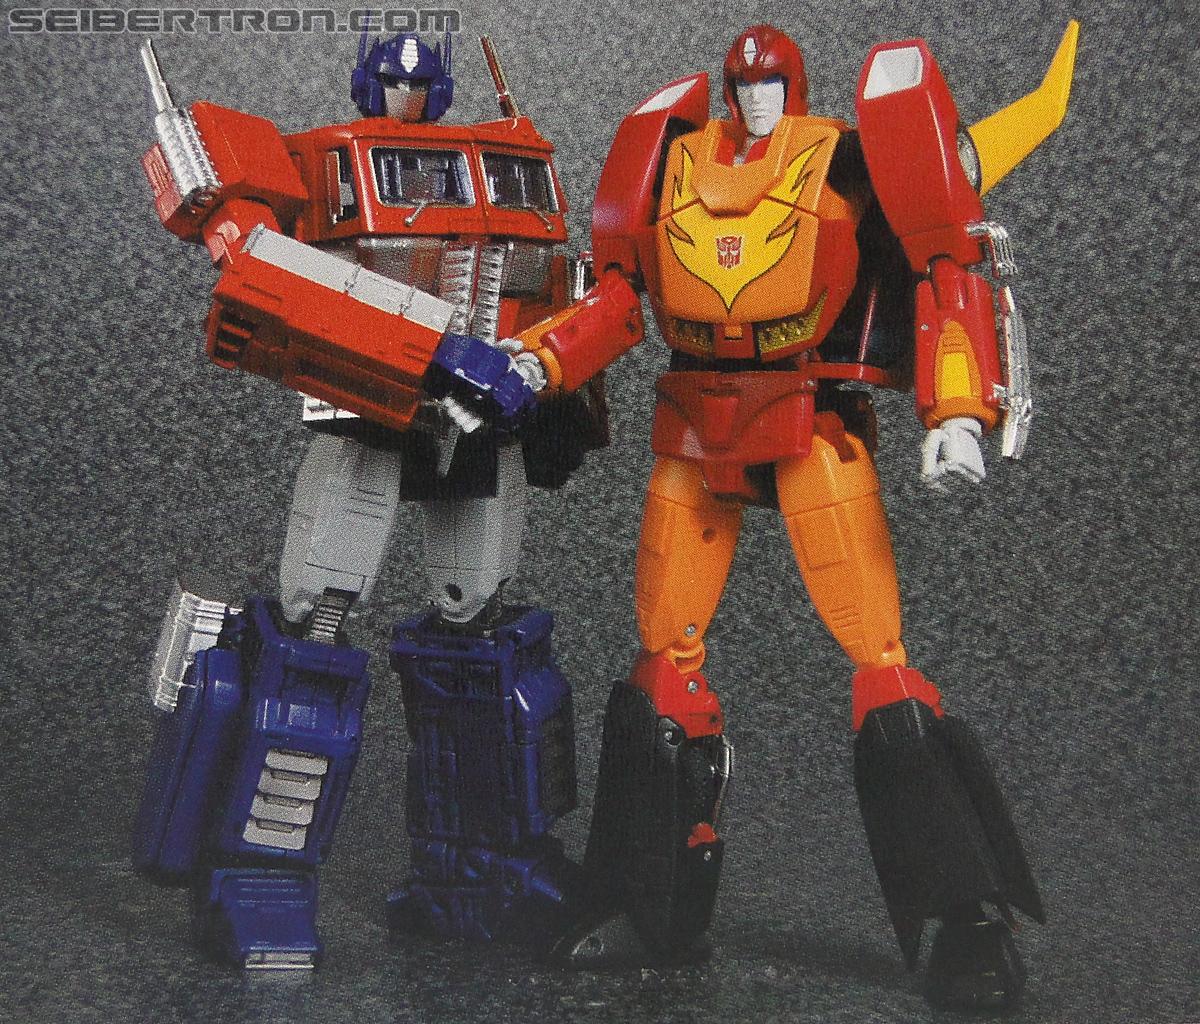 Transformers Masterpiece Optimus Prime (MP-10) (Convoy) (Image #15 of 429)